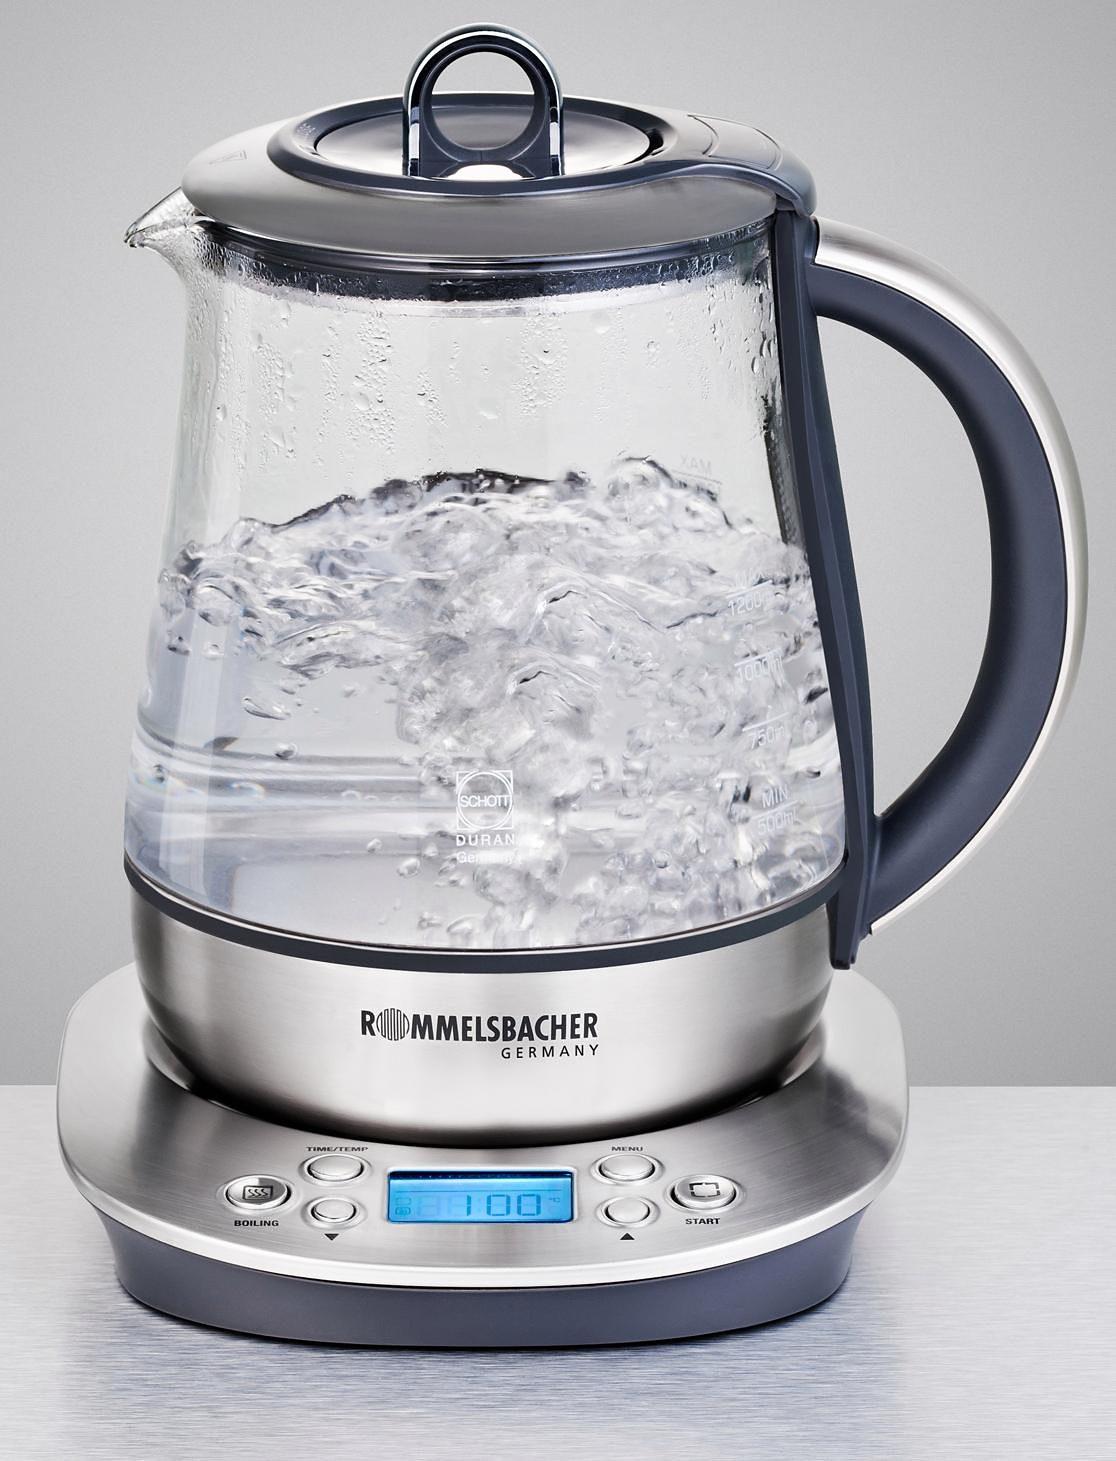 Rommelsbacher Tee- & Wasserkocher TA 1400, 1,2 Liter, 1400 Watt